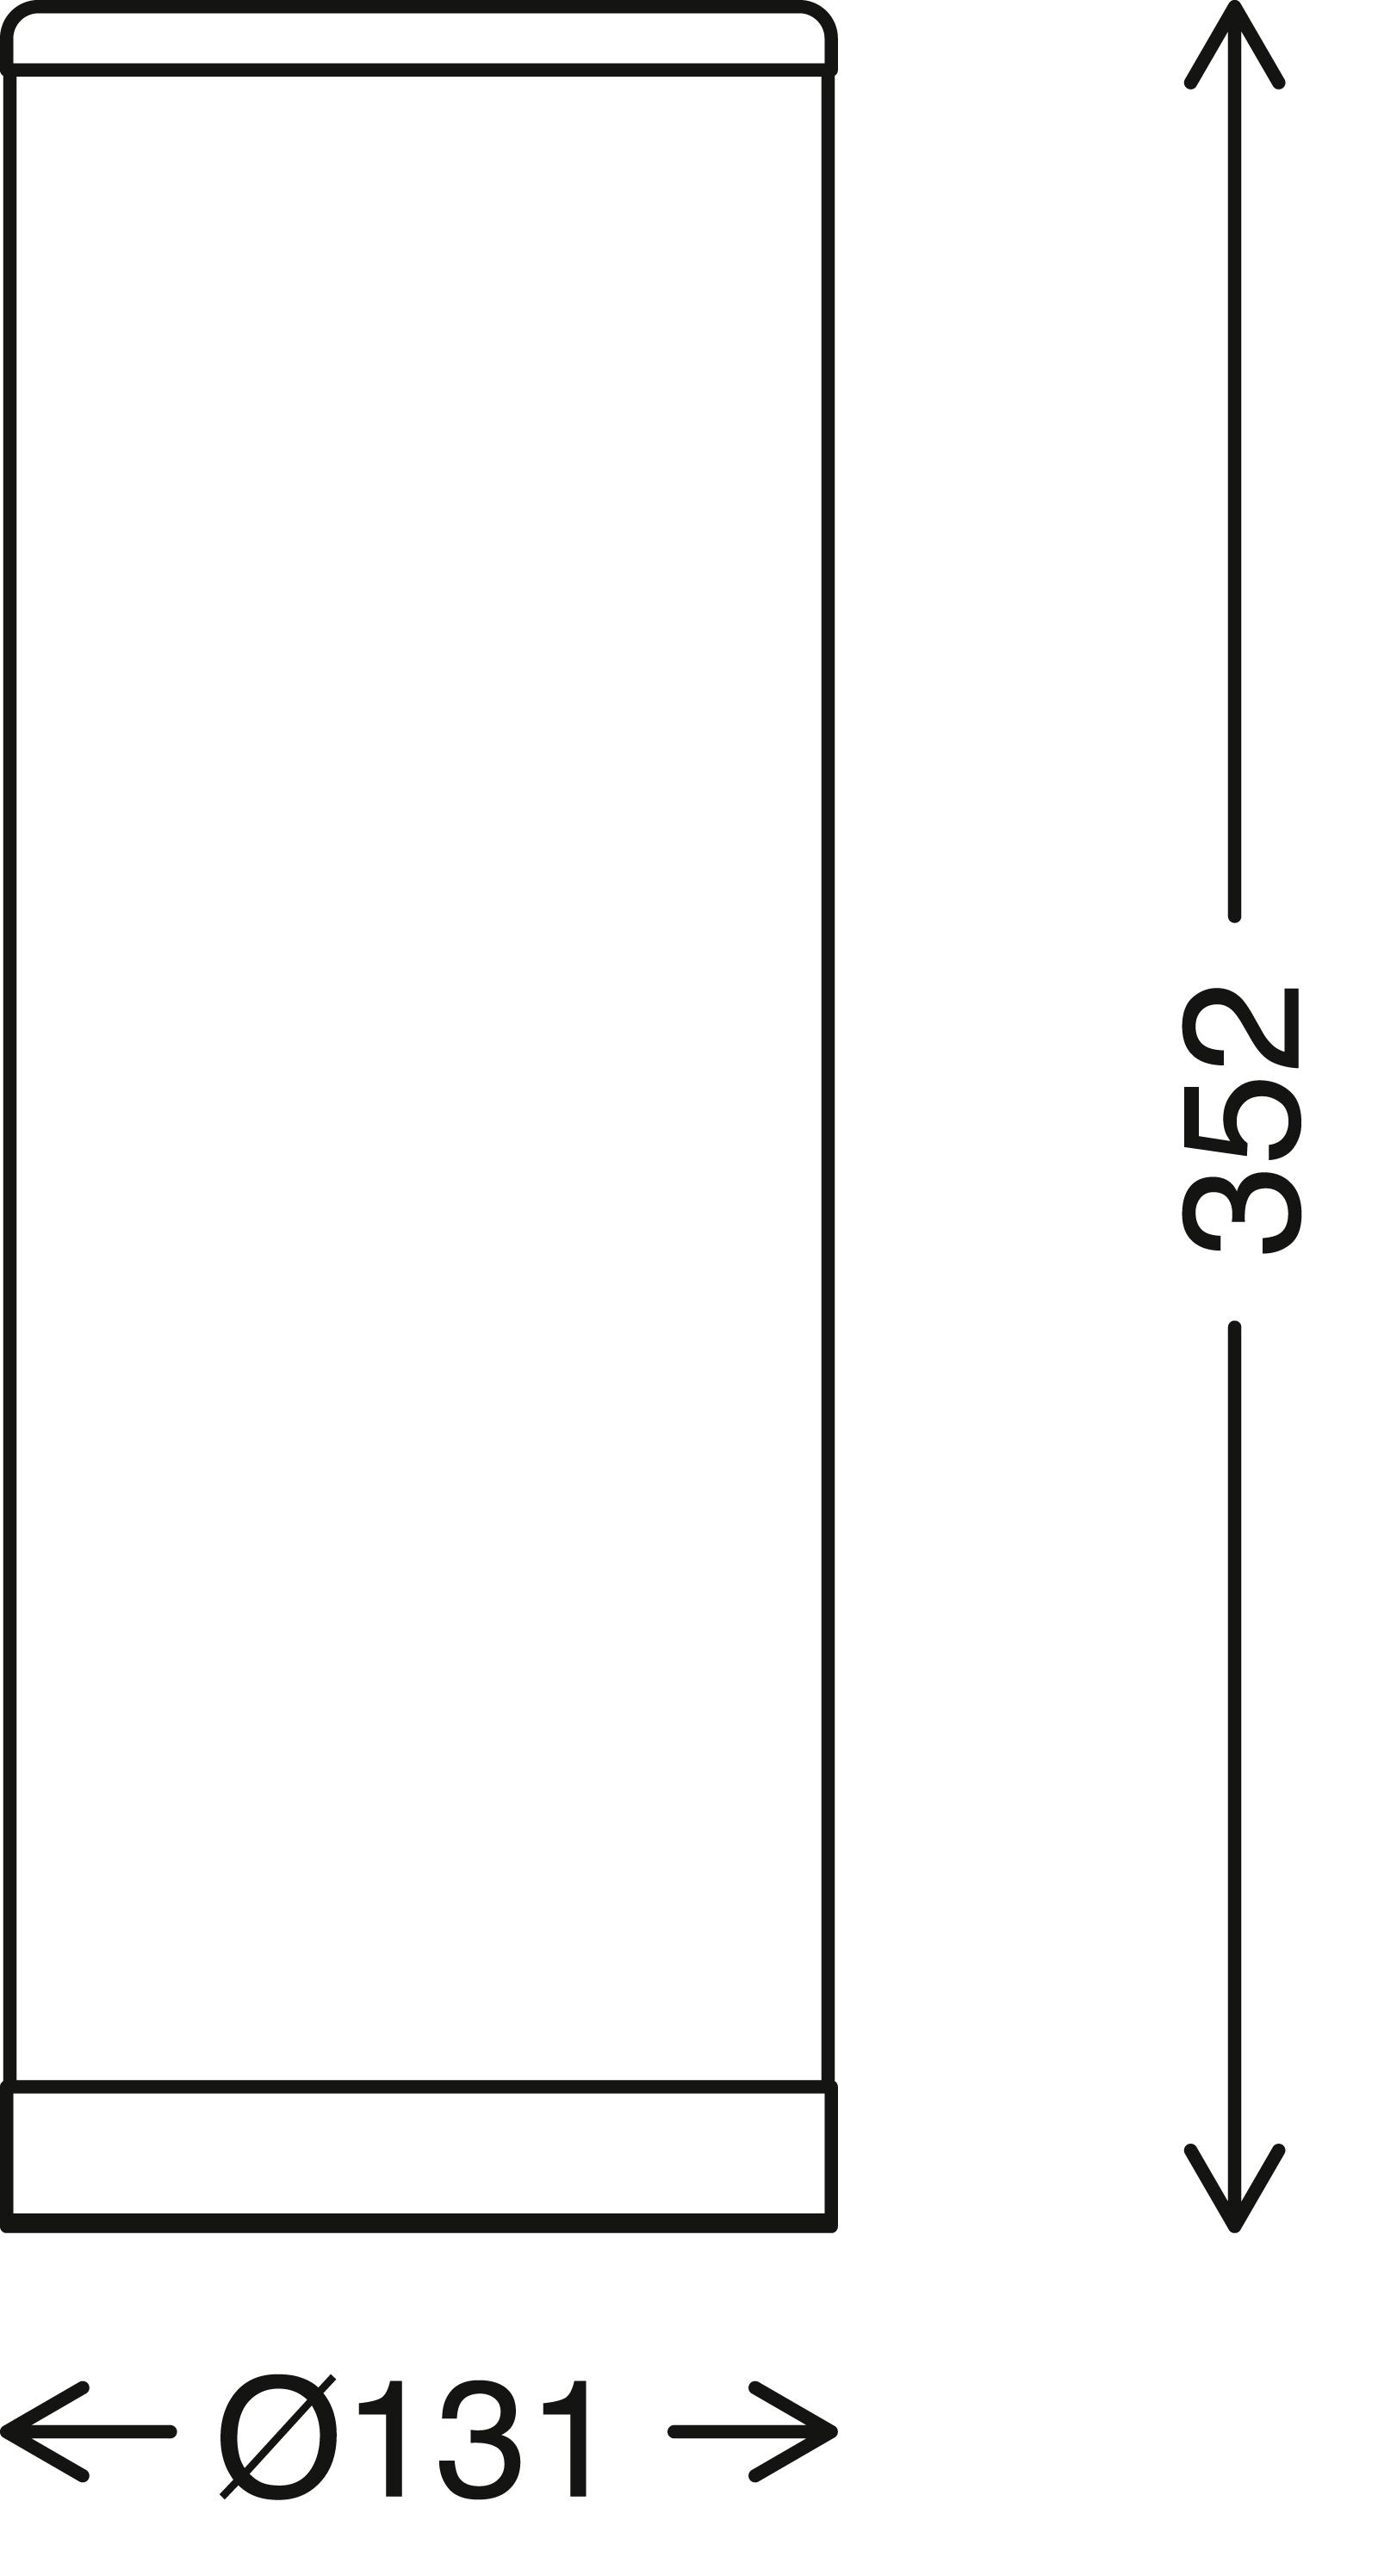 STERNENHIMMEL LED Tischleuchte, 35 cm, 5 W, Weiss-Chrom